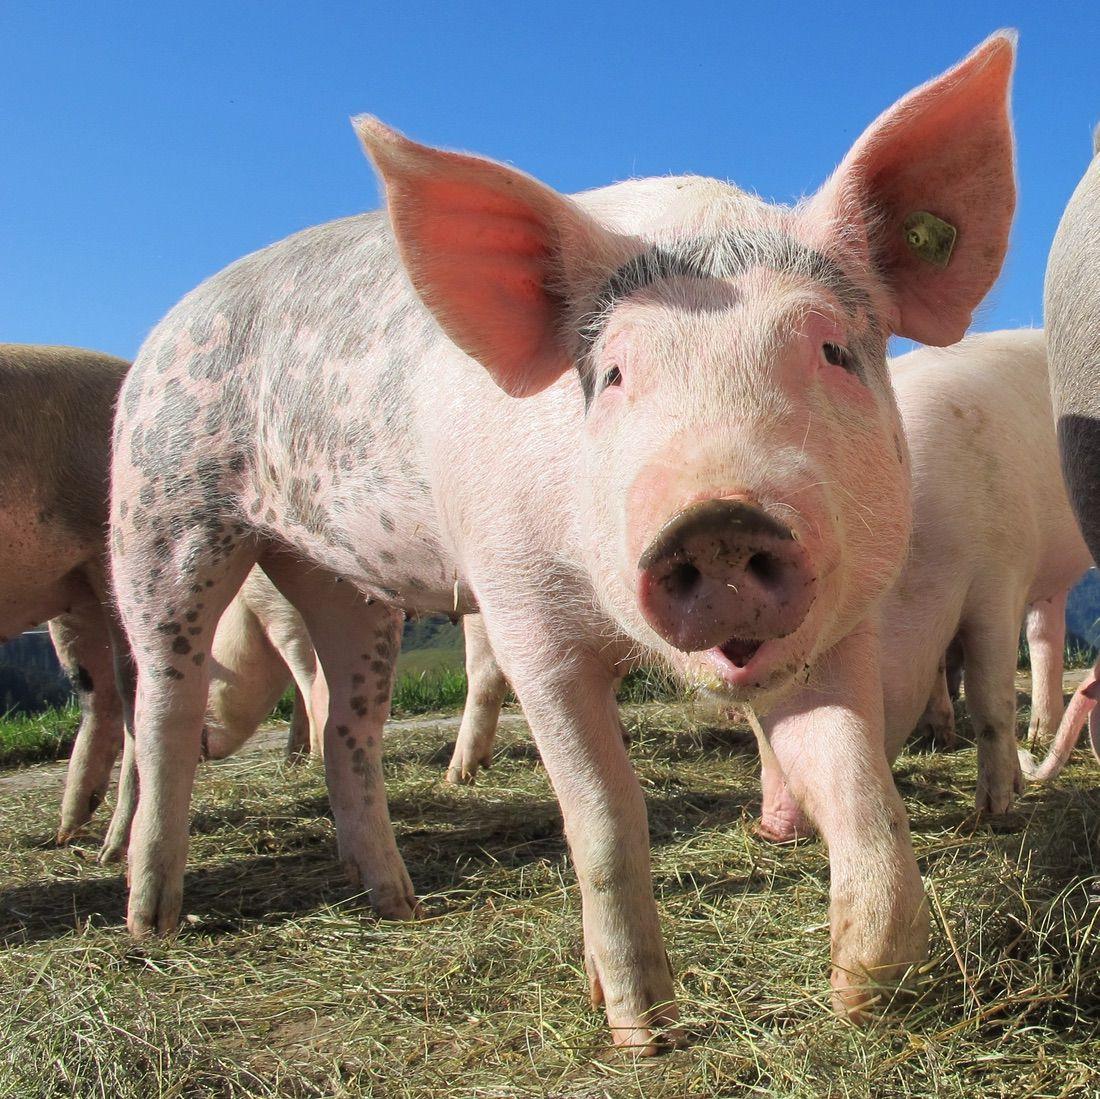 fan-animal-la-isla-del-caribe-habitada-por-cerdos-5